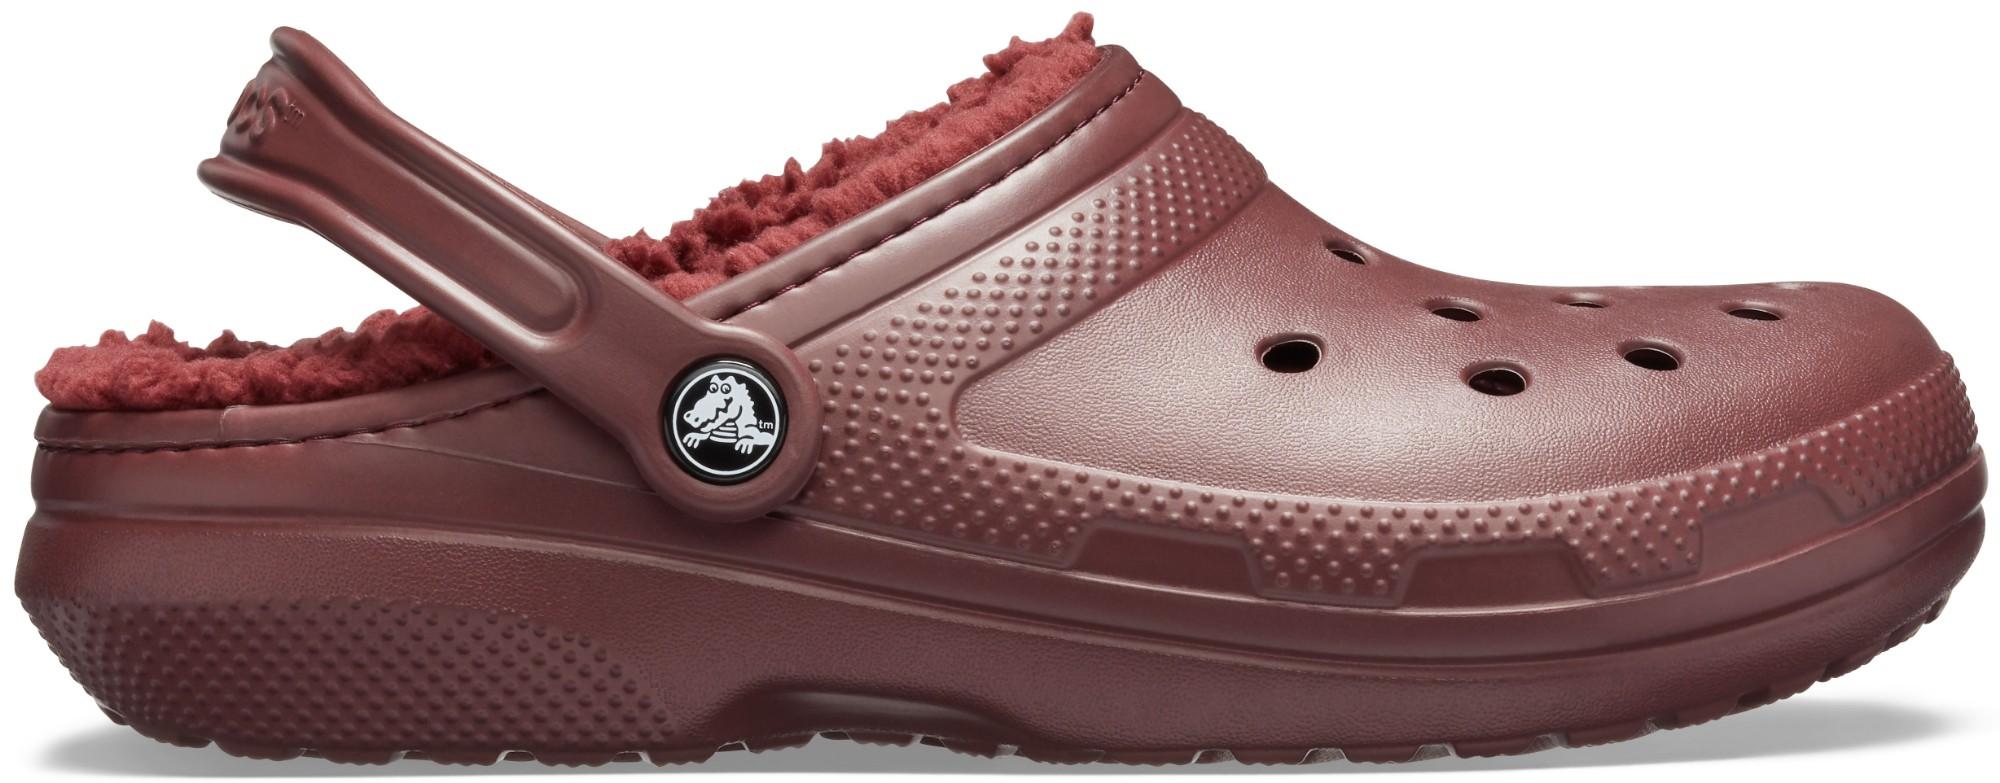 Crocs™ Classic Lined Clog Burgundy/Burgundy 37,5